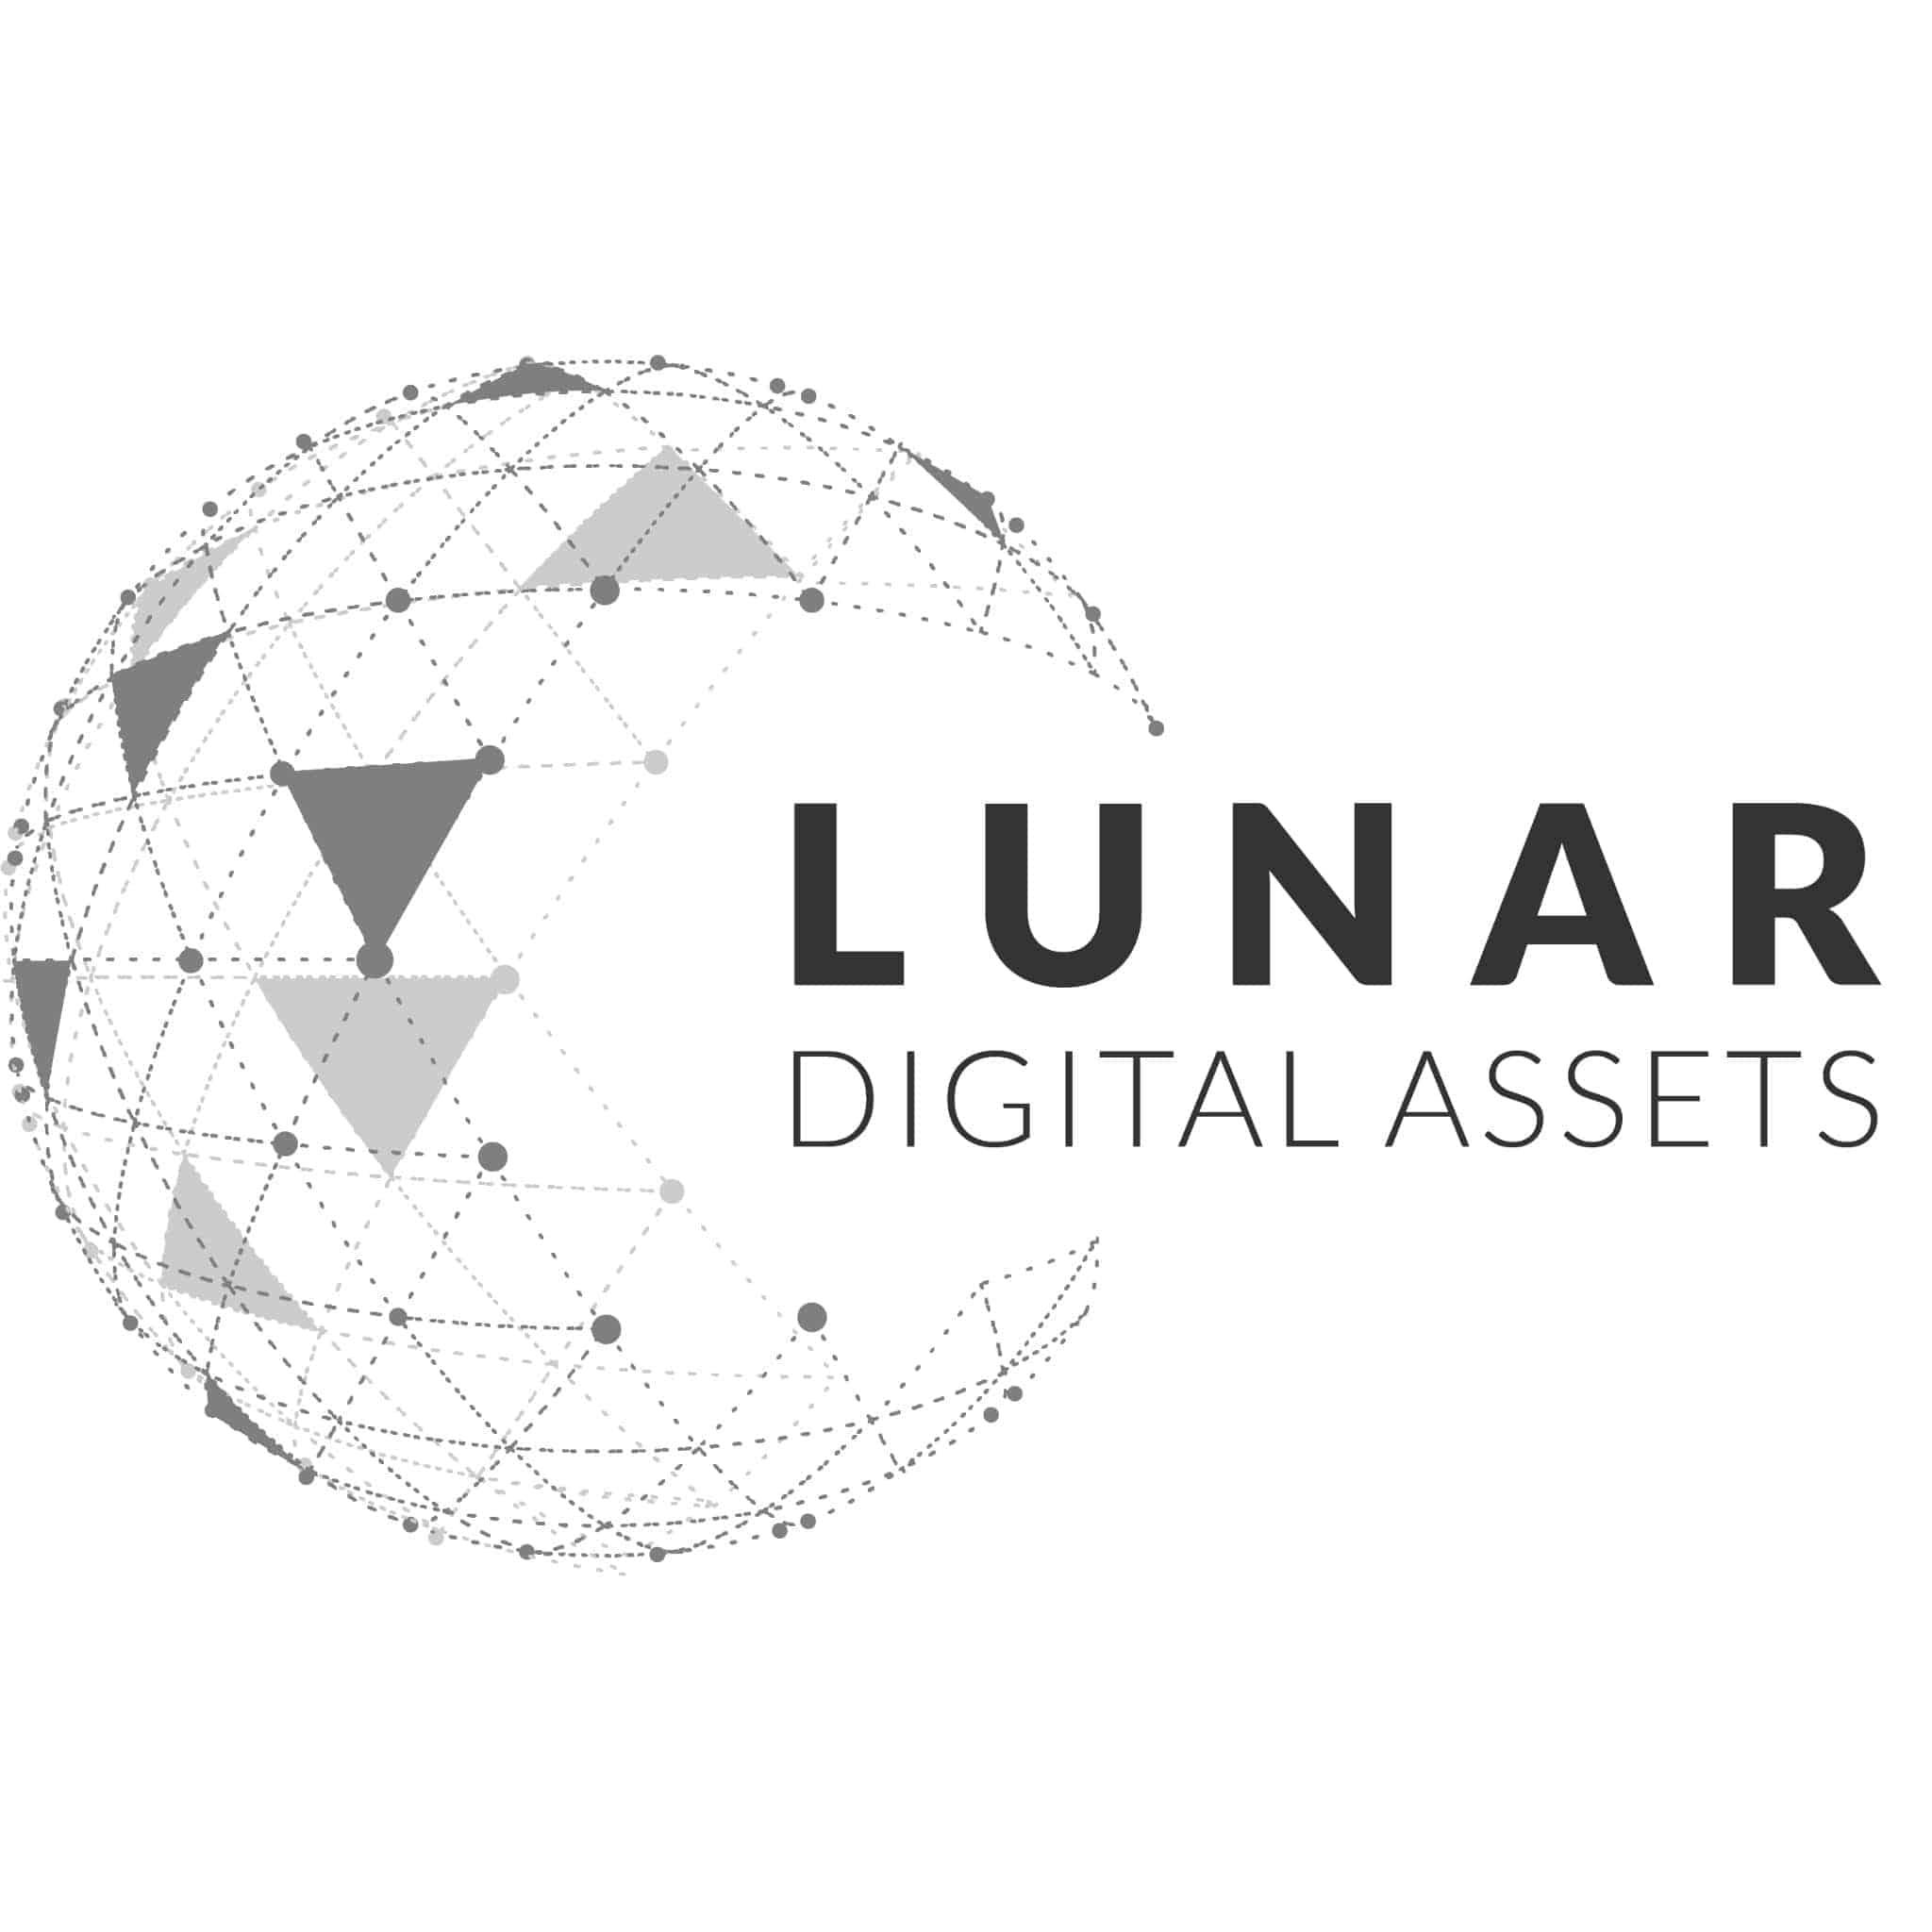 7-lunardigitalassets logo